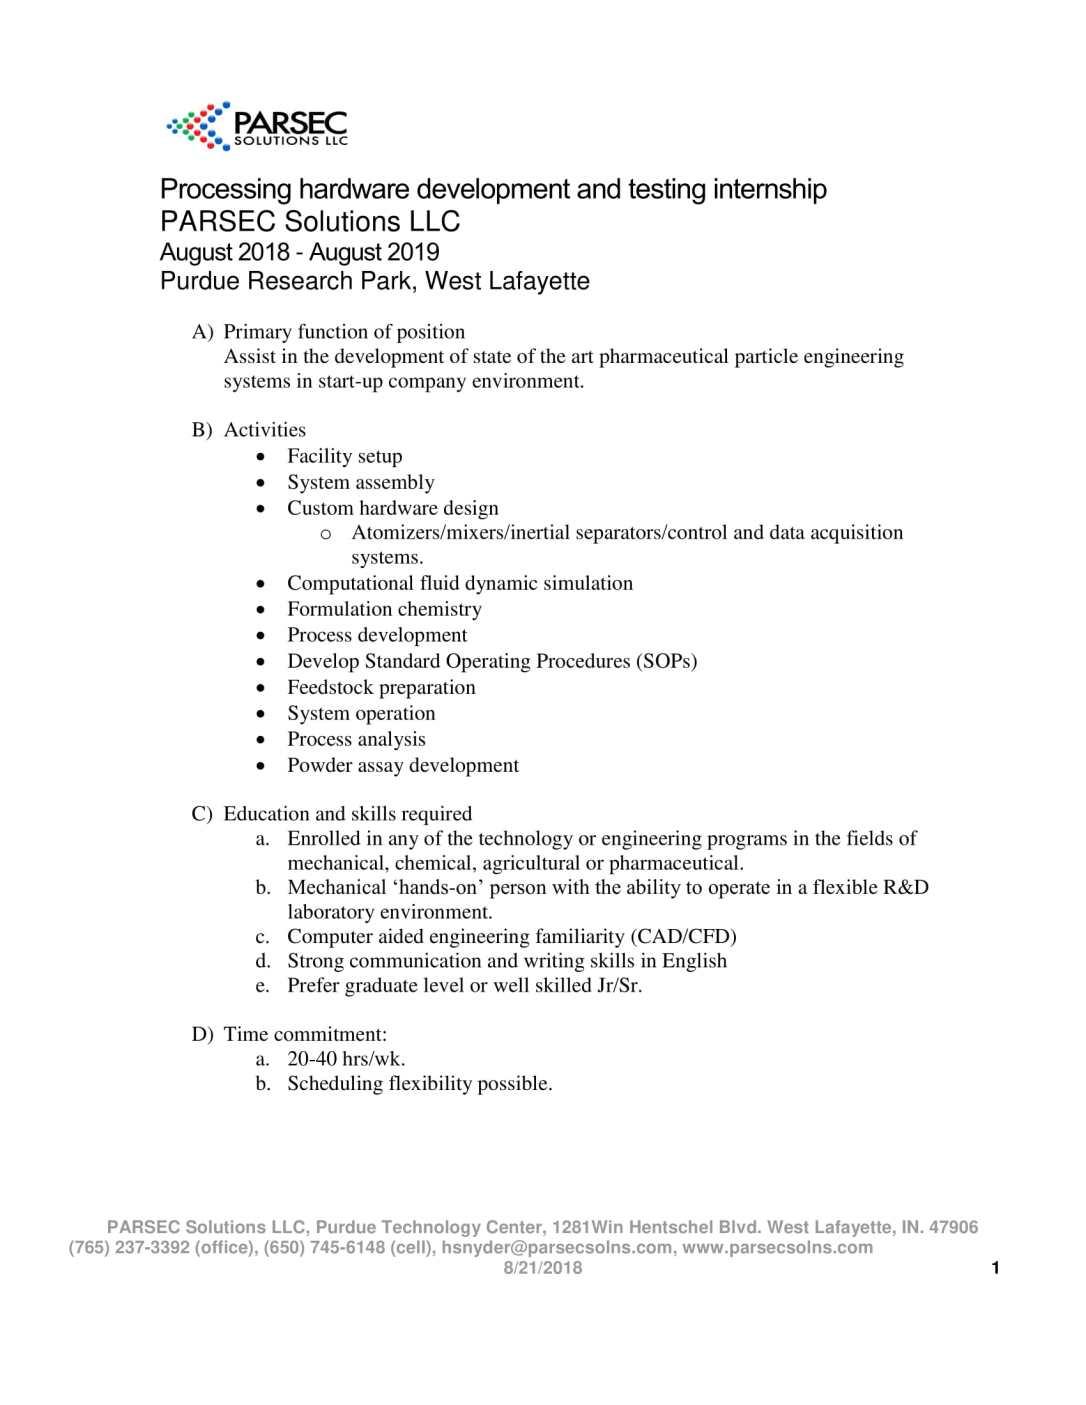 PARSEC_Design_test_intern_20Aug18-1